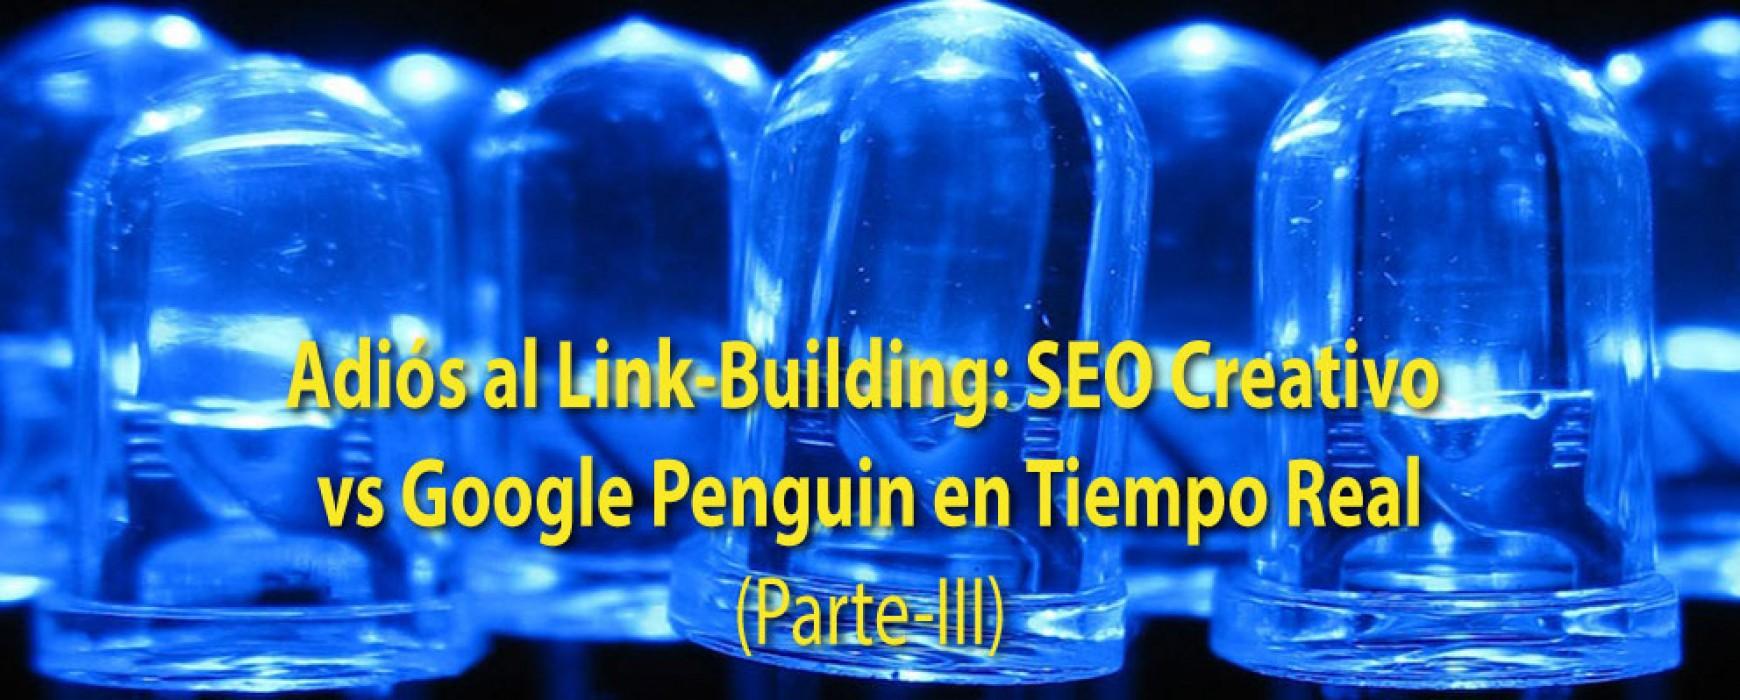 SEO Creativo vs Google Penguin (Parte-III)